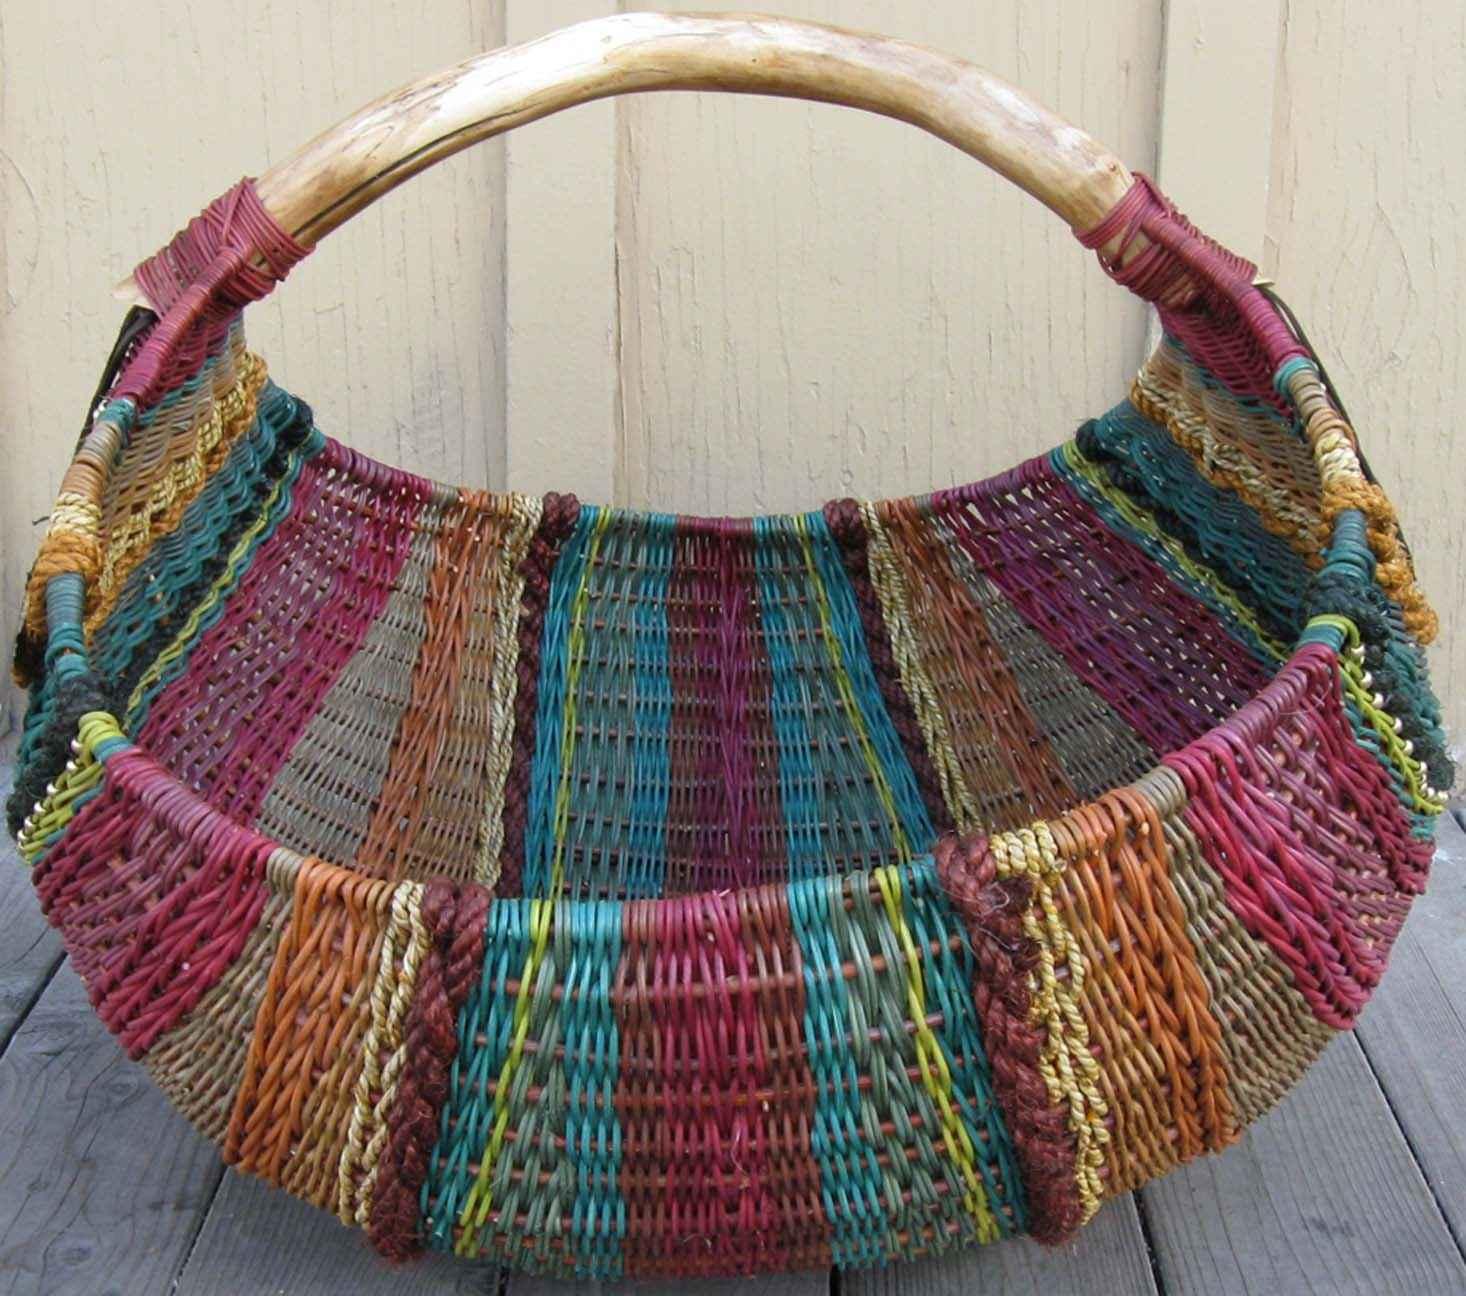 Aspen Handle Basket #... by  Montana Blue Heron - Masterpiece Online